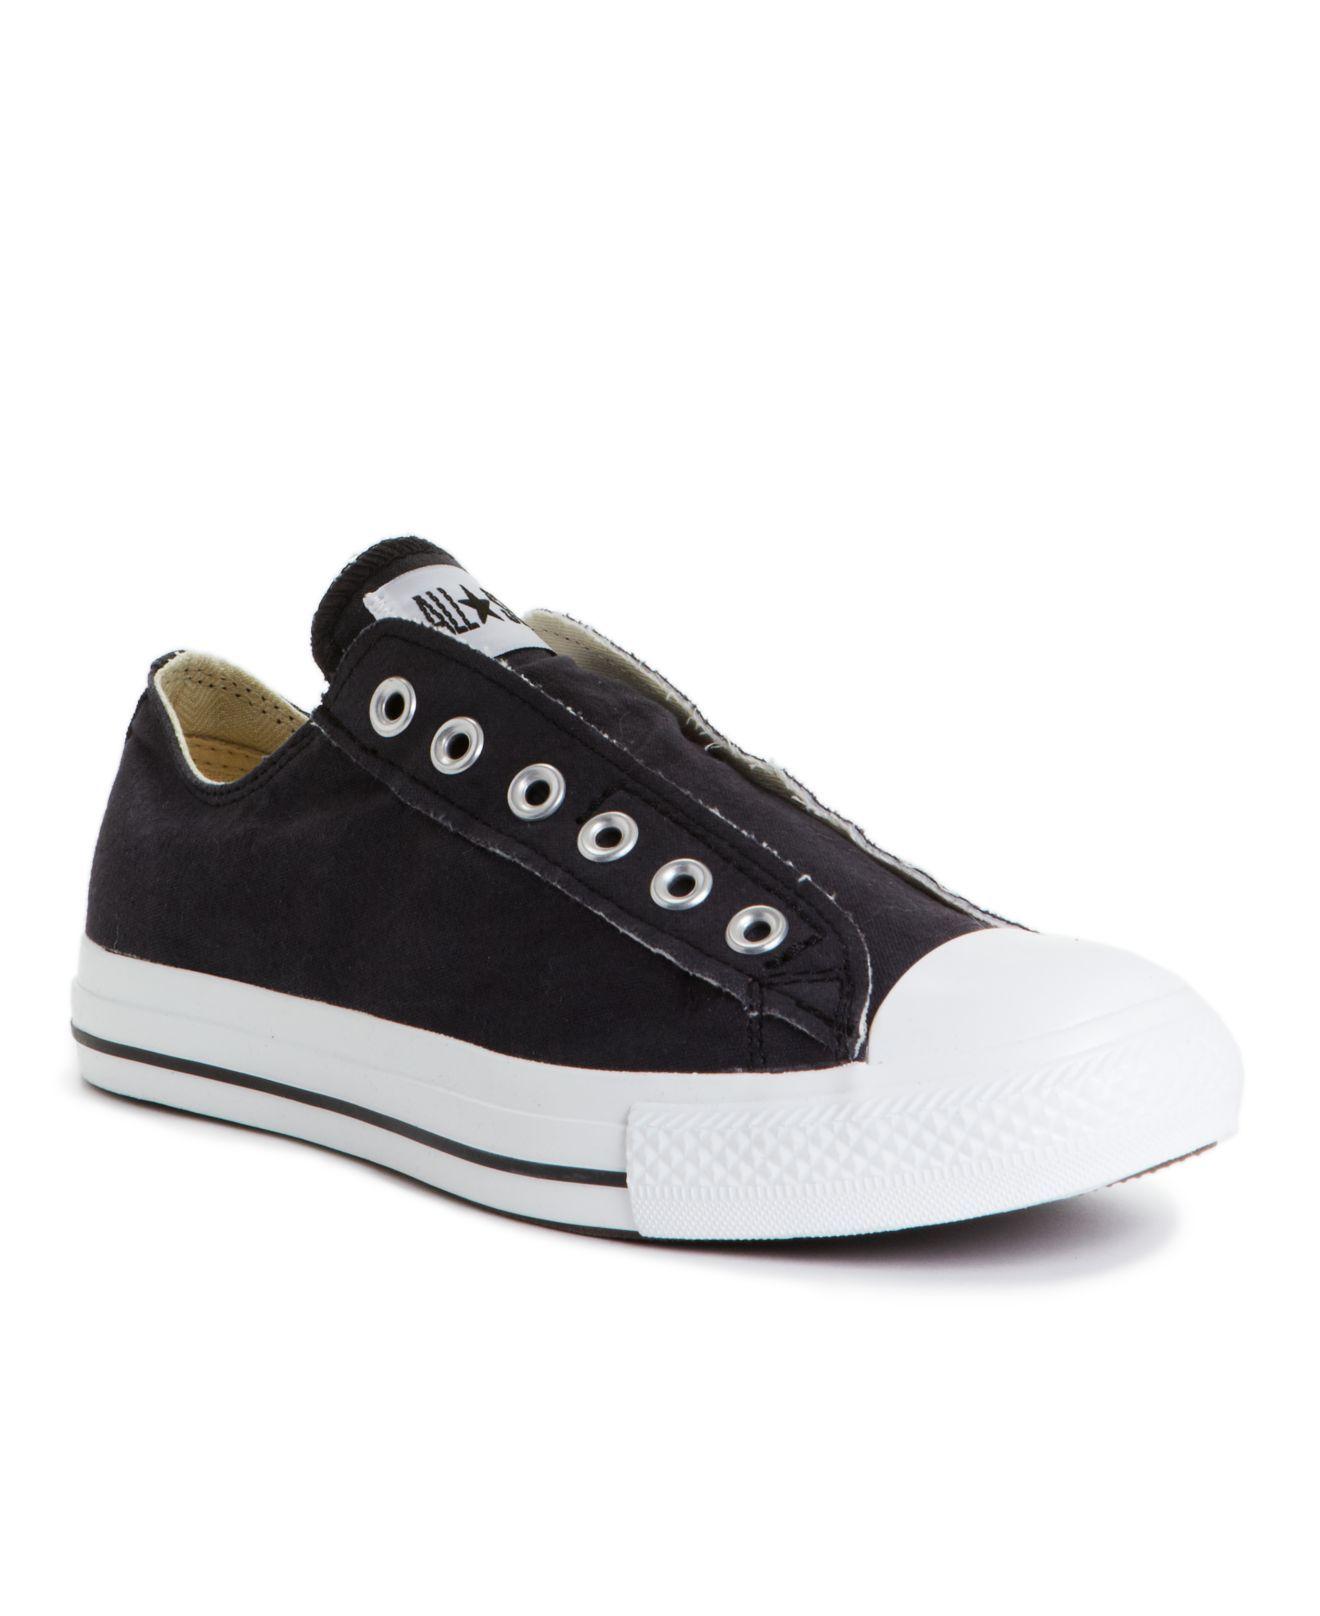 Converse Men's Shoes, Chuck Taylor Laceless Sneakers Mens